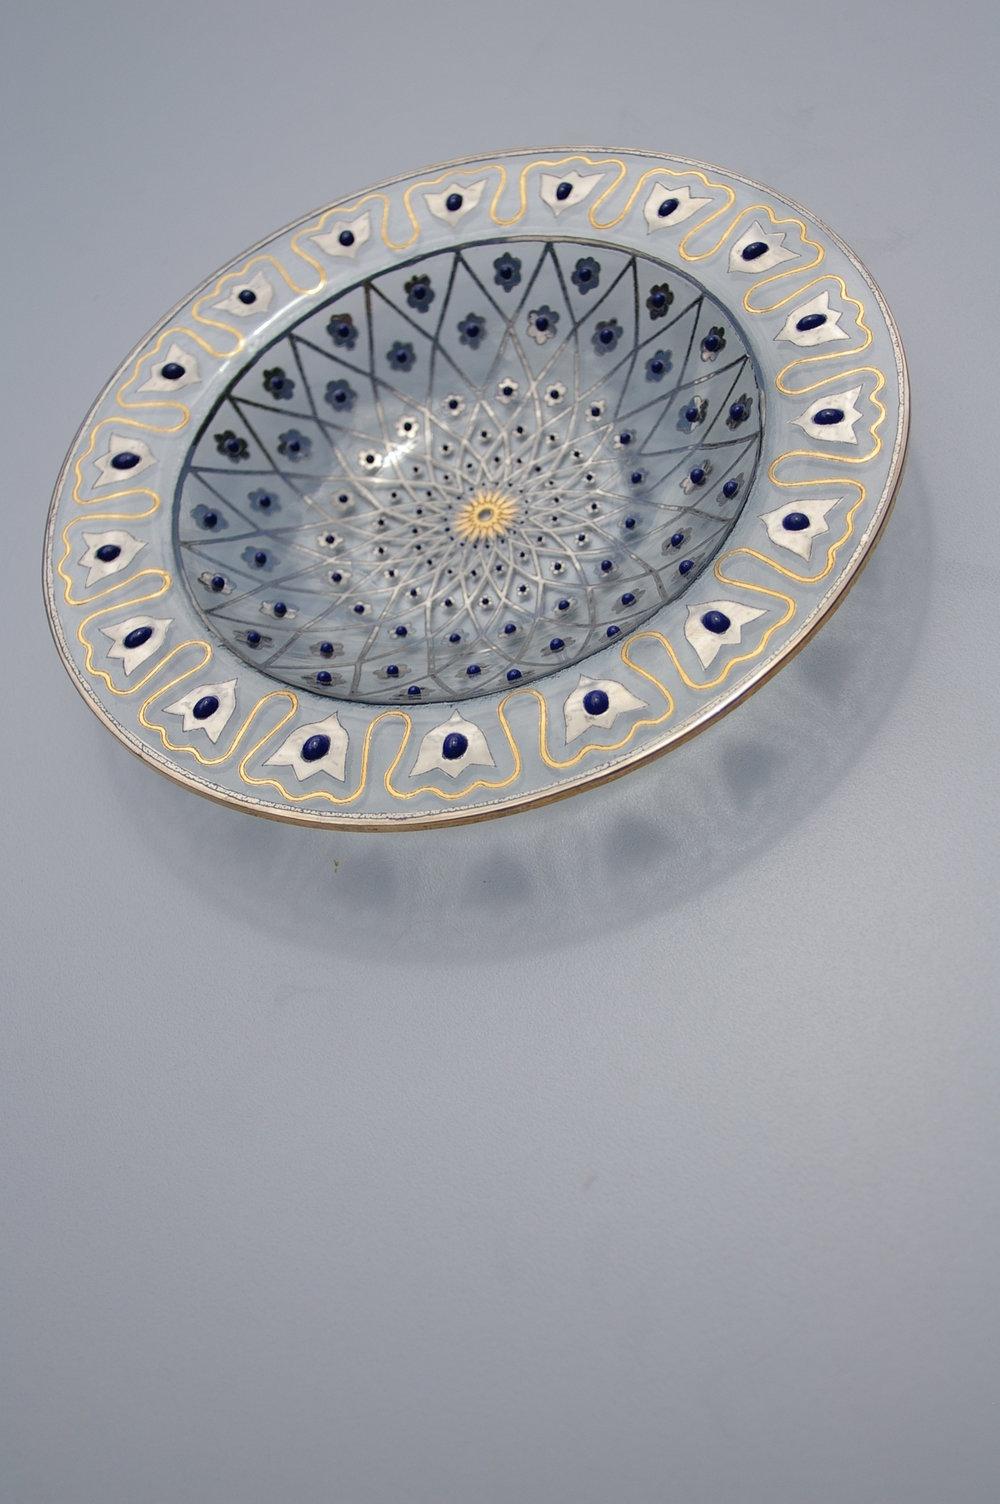 Glass bowl by Peter Crisp